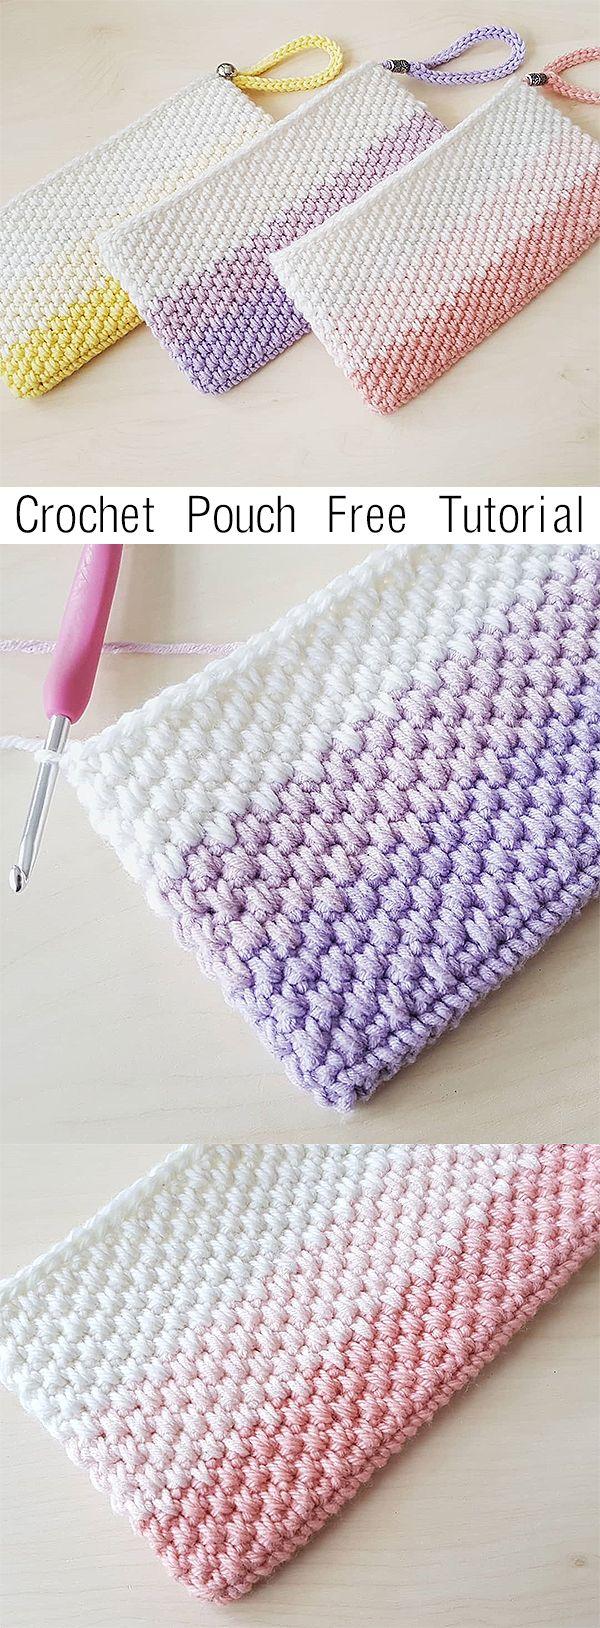 Crochet Pouch - free tutorial